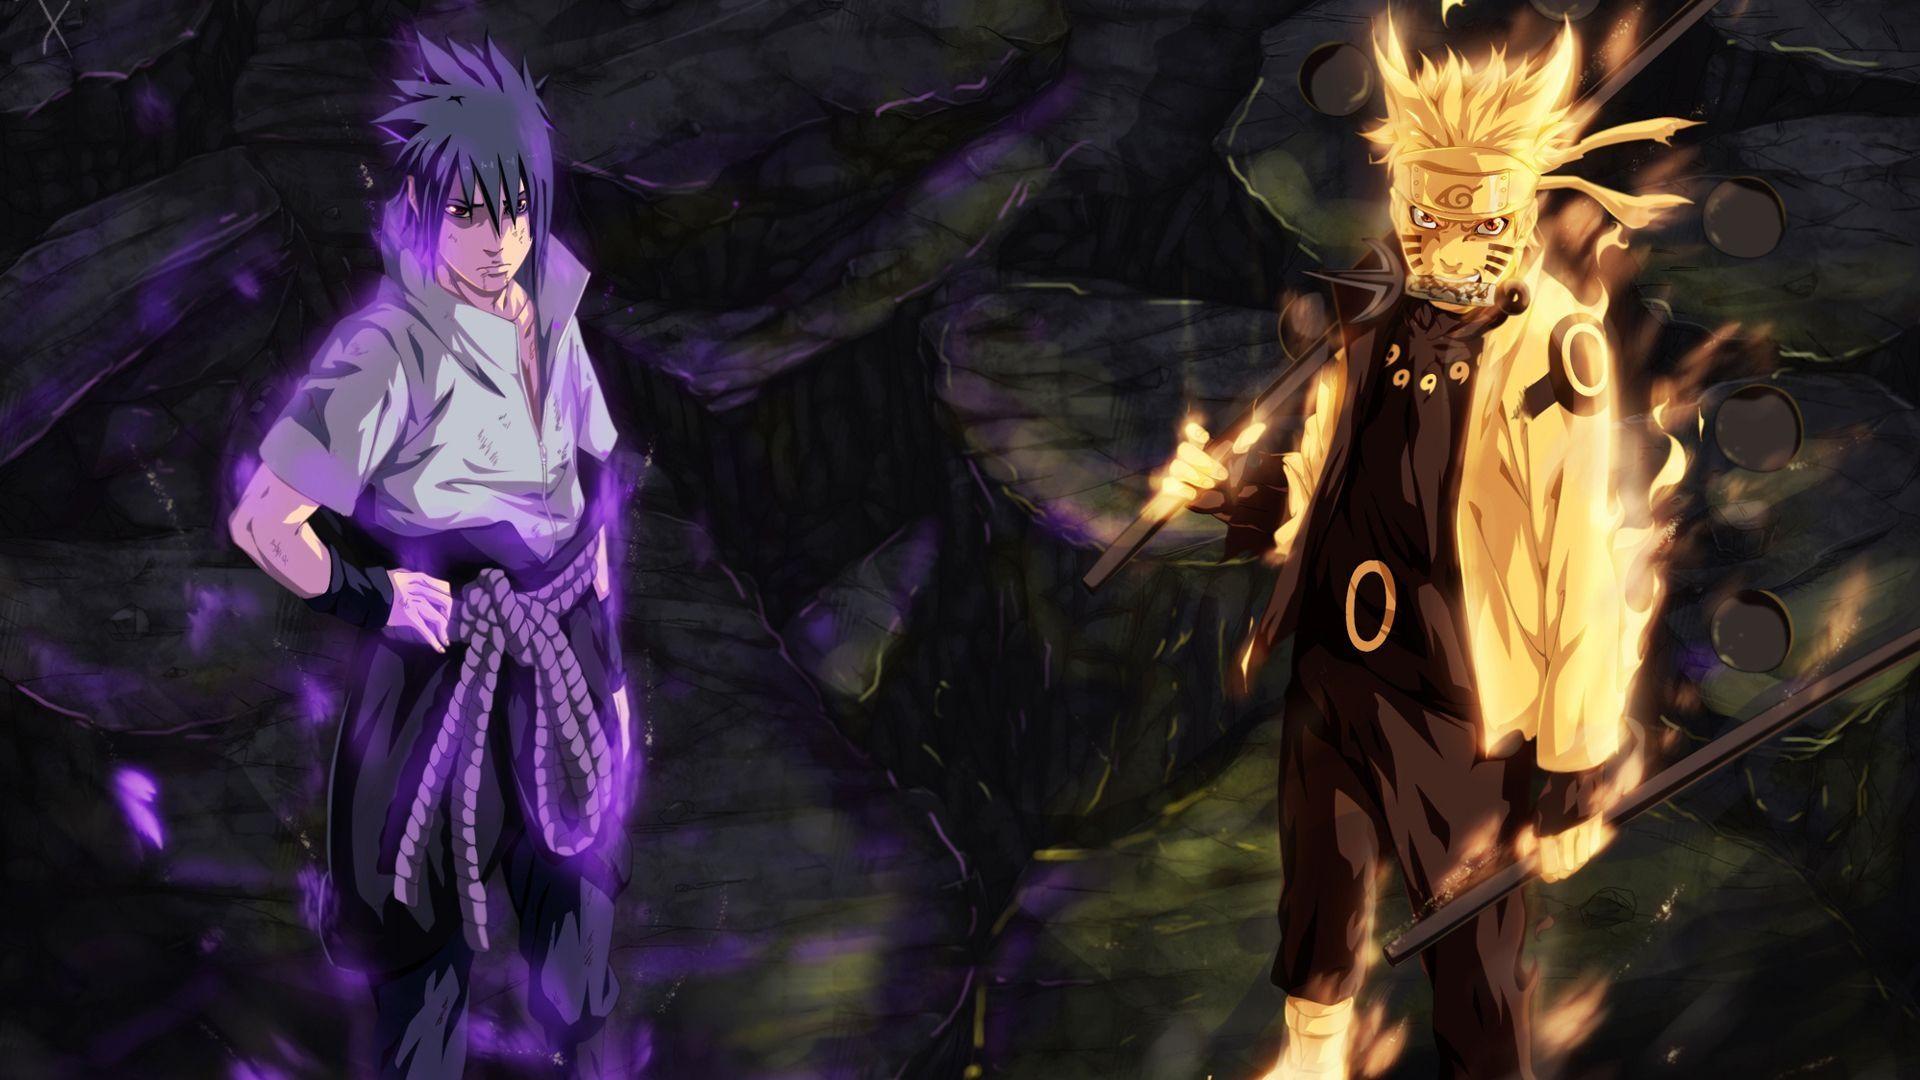 Naruto and Sasuke, HD Wallpaper